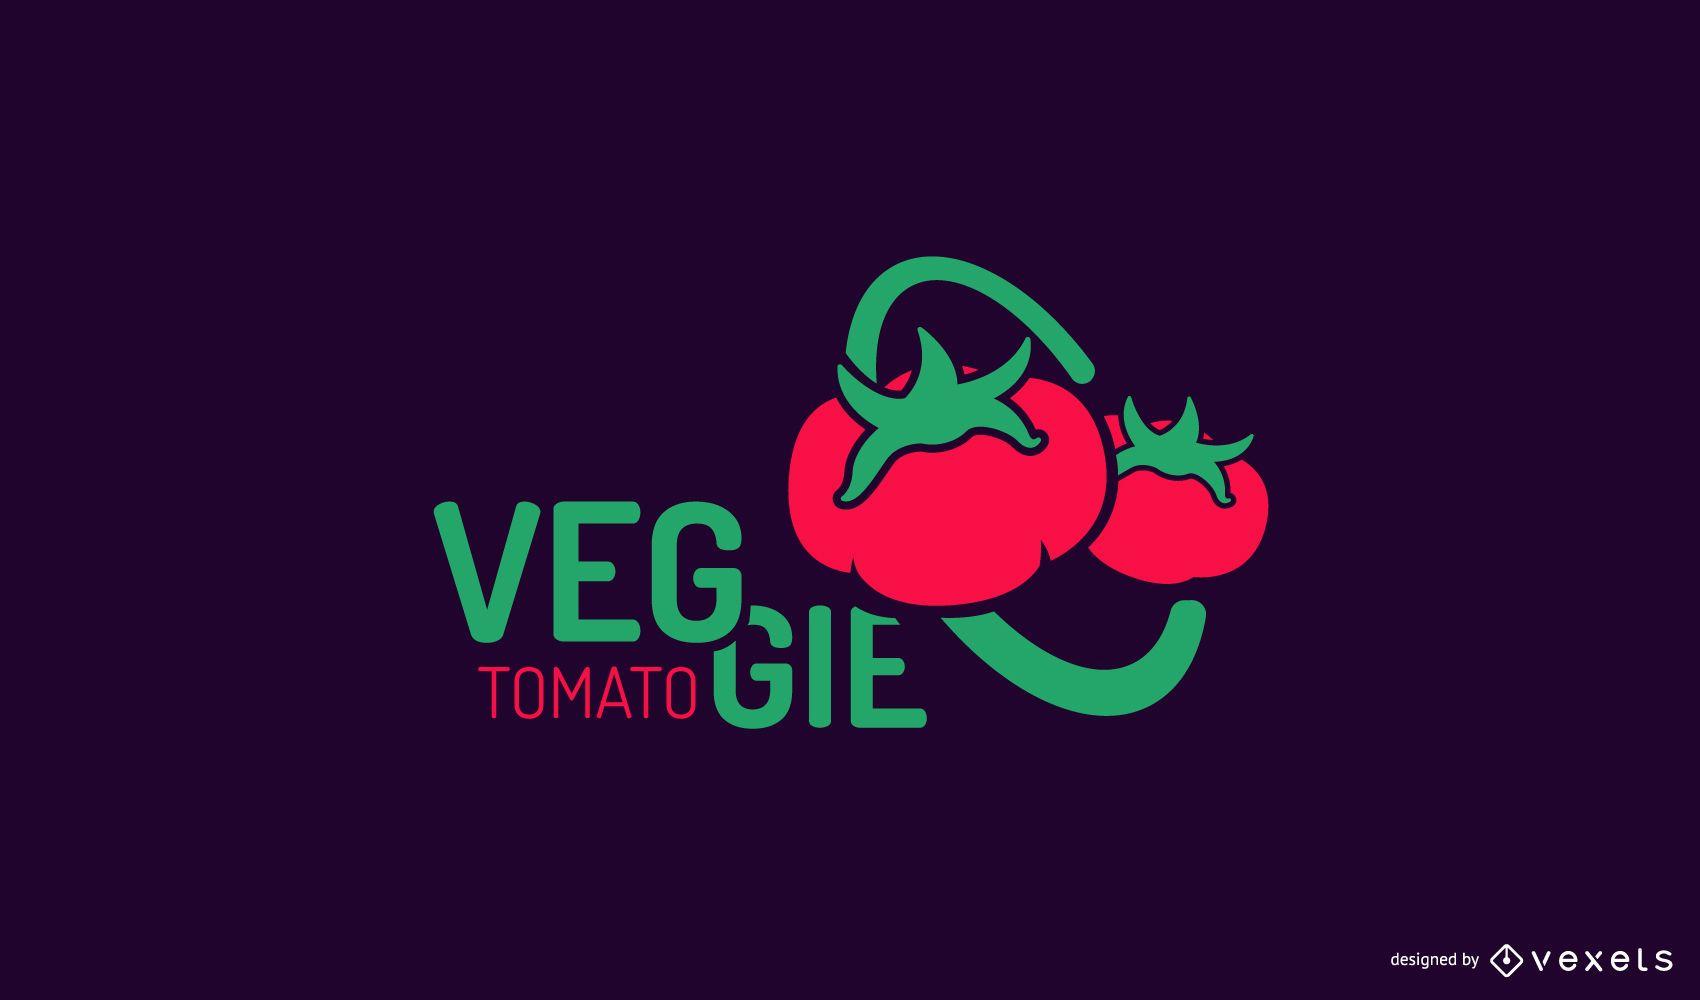 Plantilla de logotipo de tomate vegetal